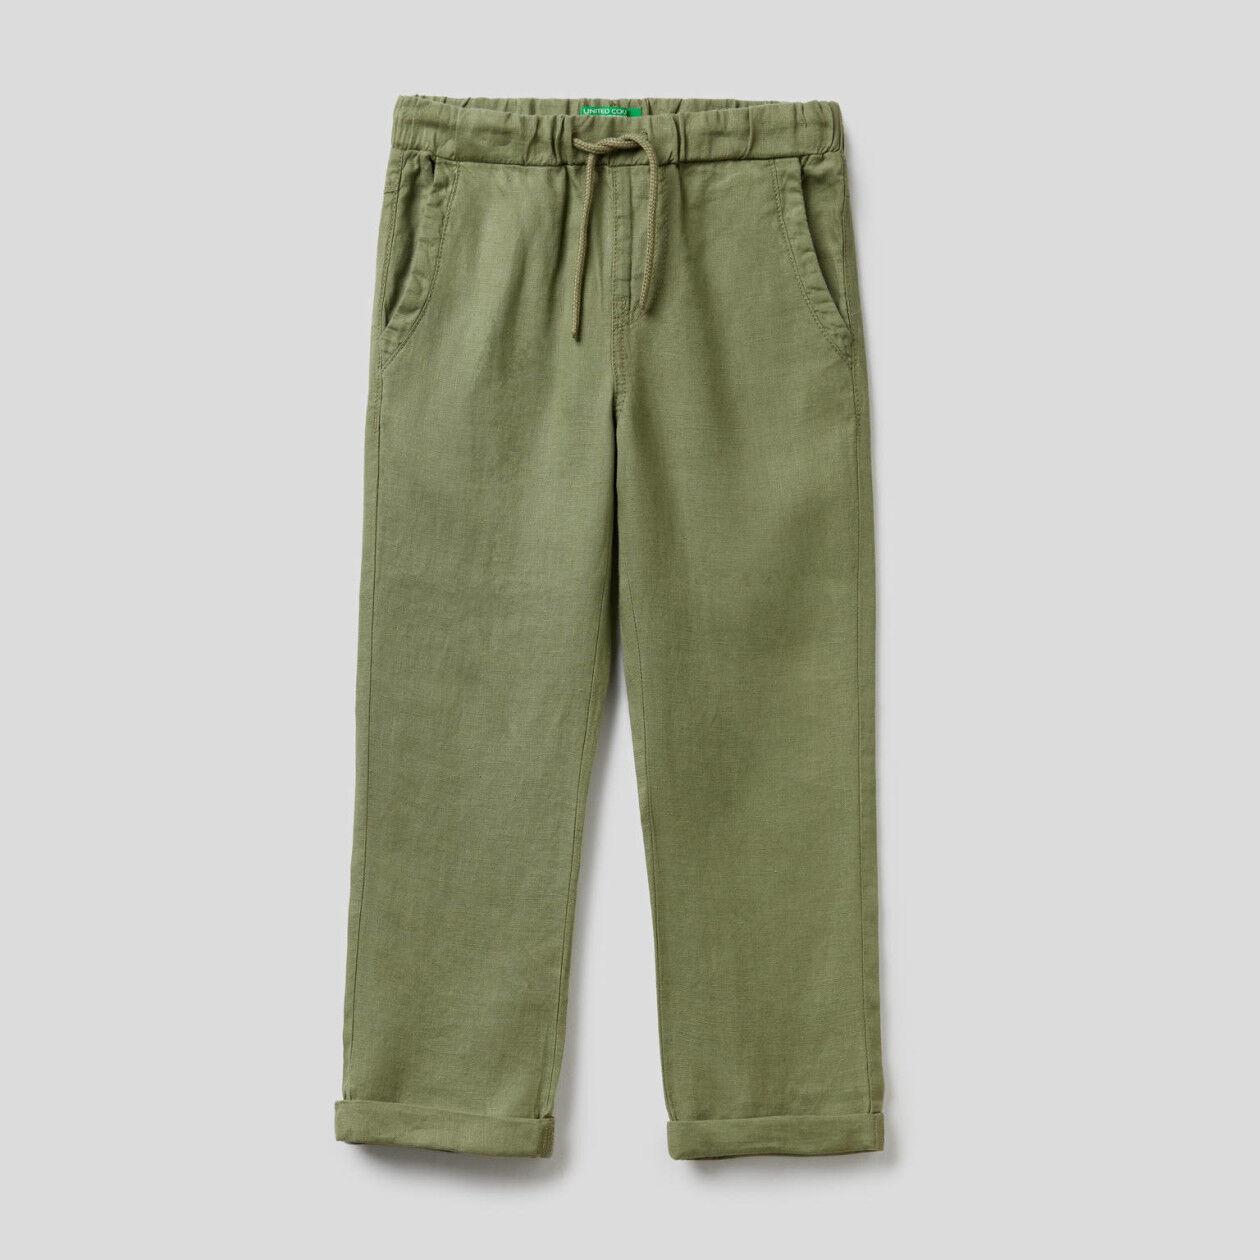 Pantalon 100% lin avec cordon de serrage